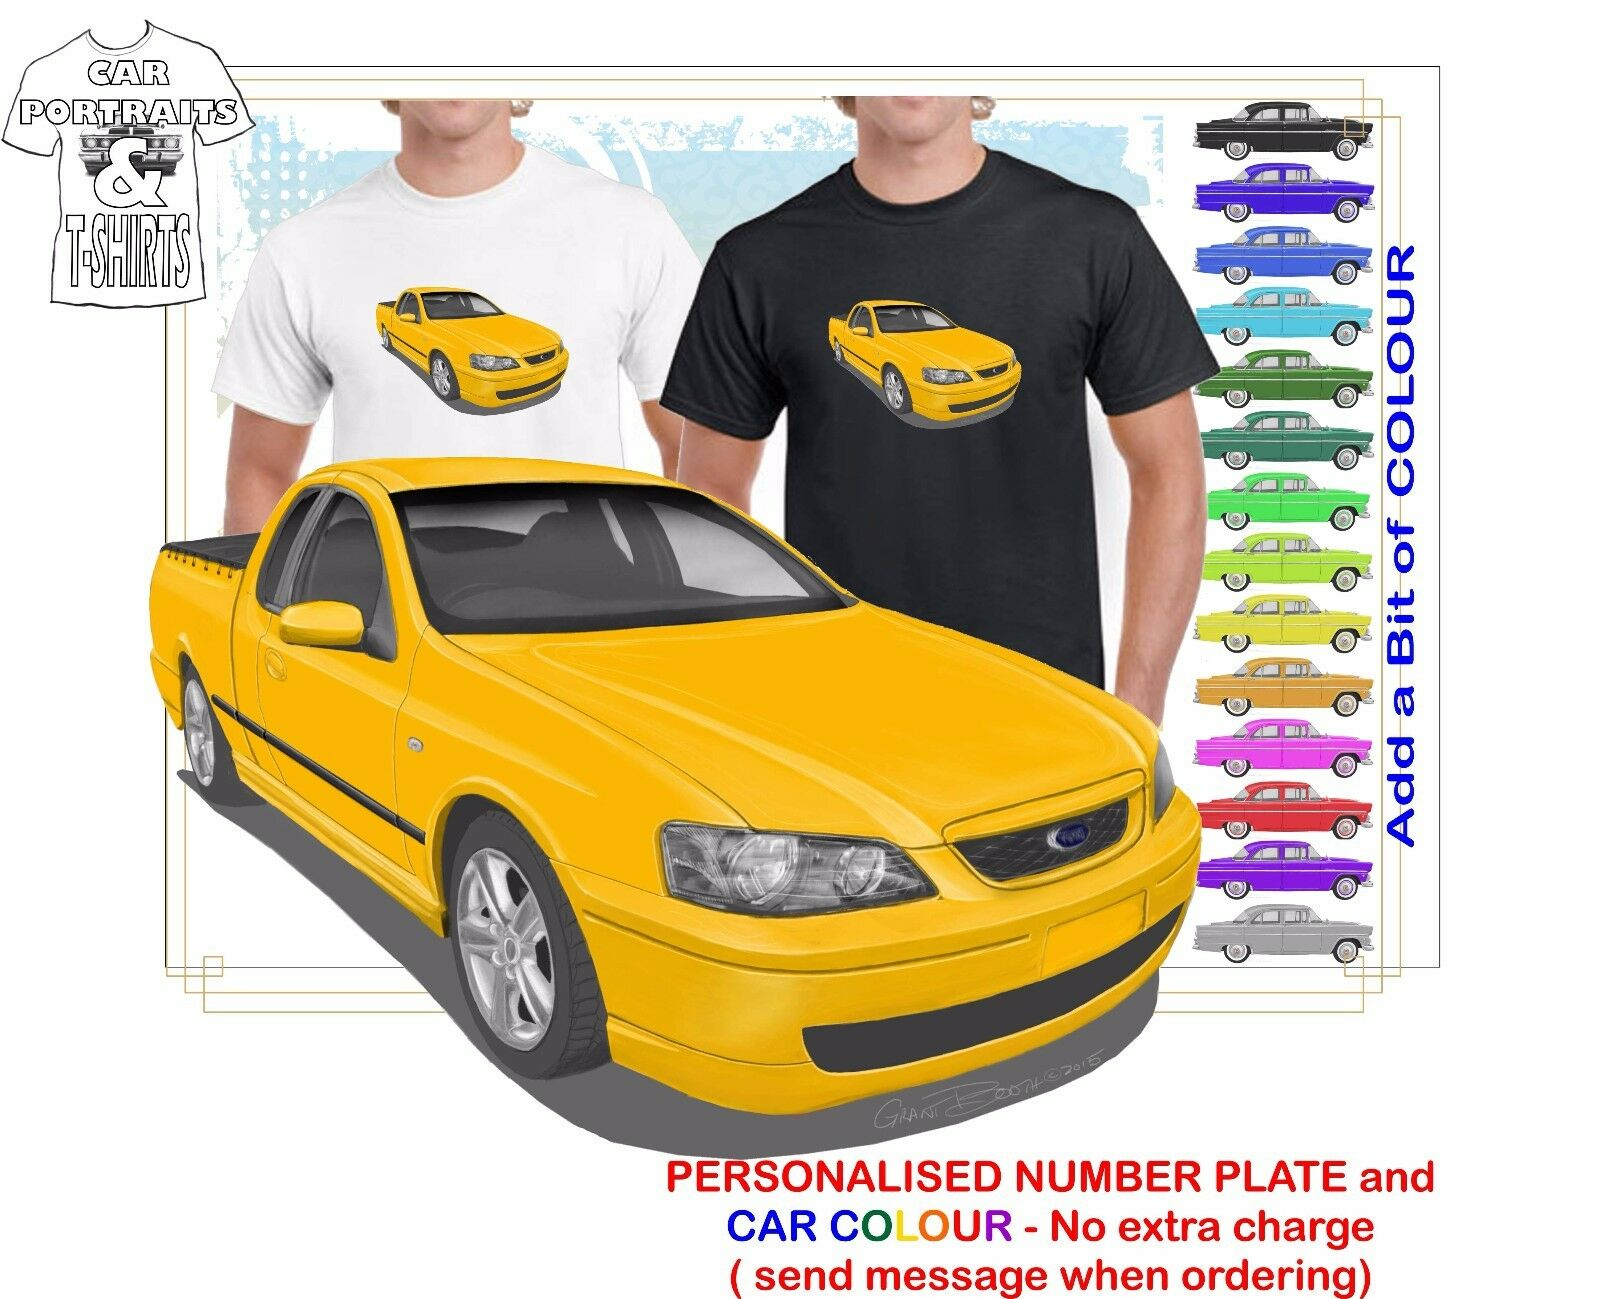 CLASSIC 2002-07 BA FALCON UTE ILLUSTRATED T-SHIRT MUSCLE RETRO SPORT CAR